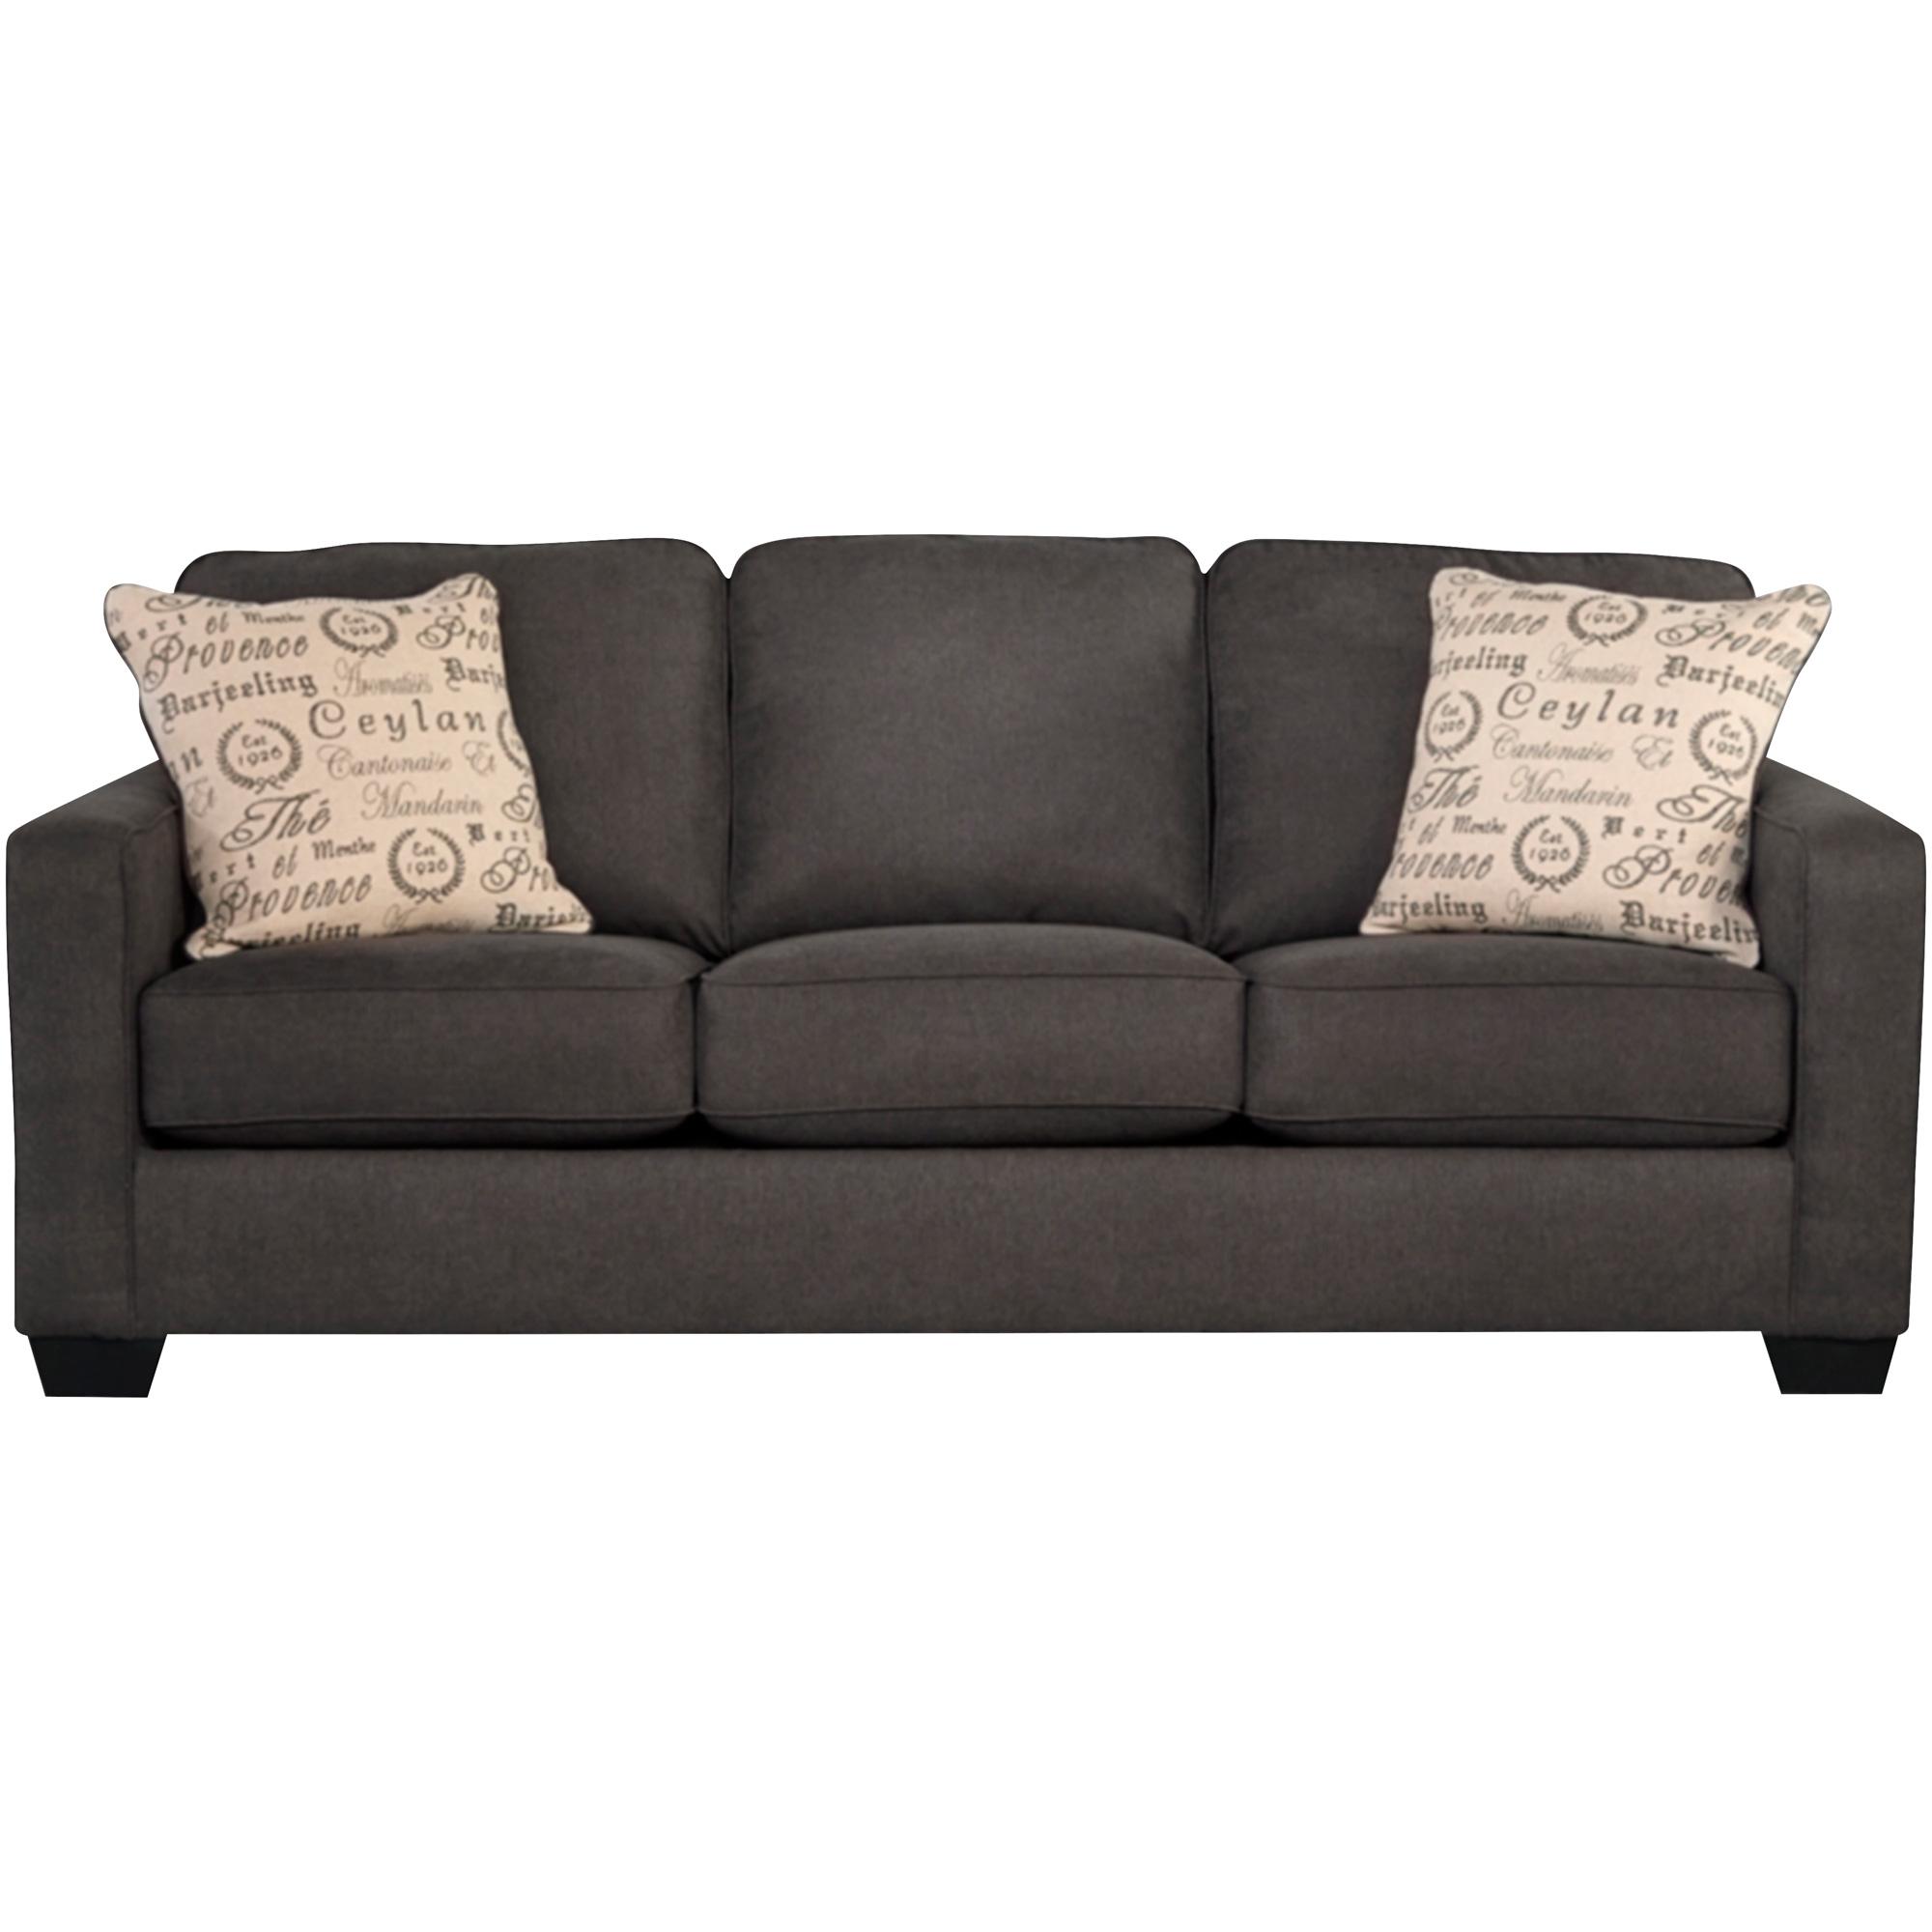 Ashley Furniture | Alenya Charcoal Queen Sofa Sleeper